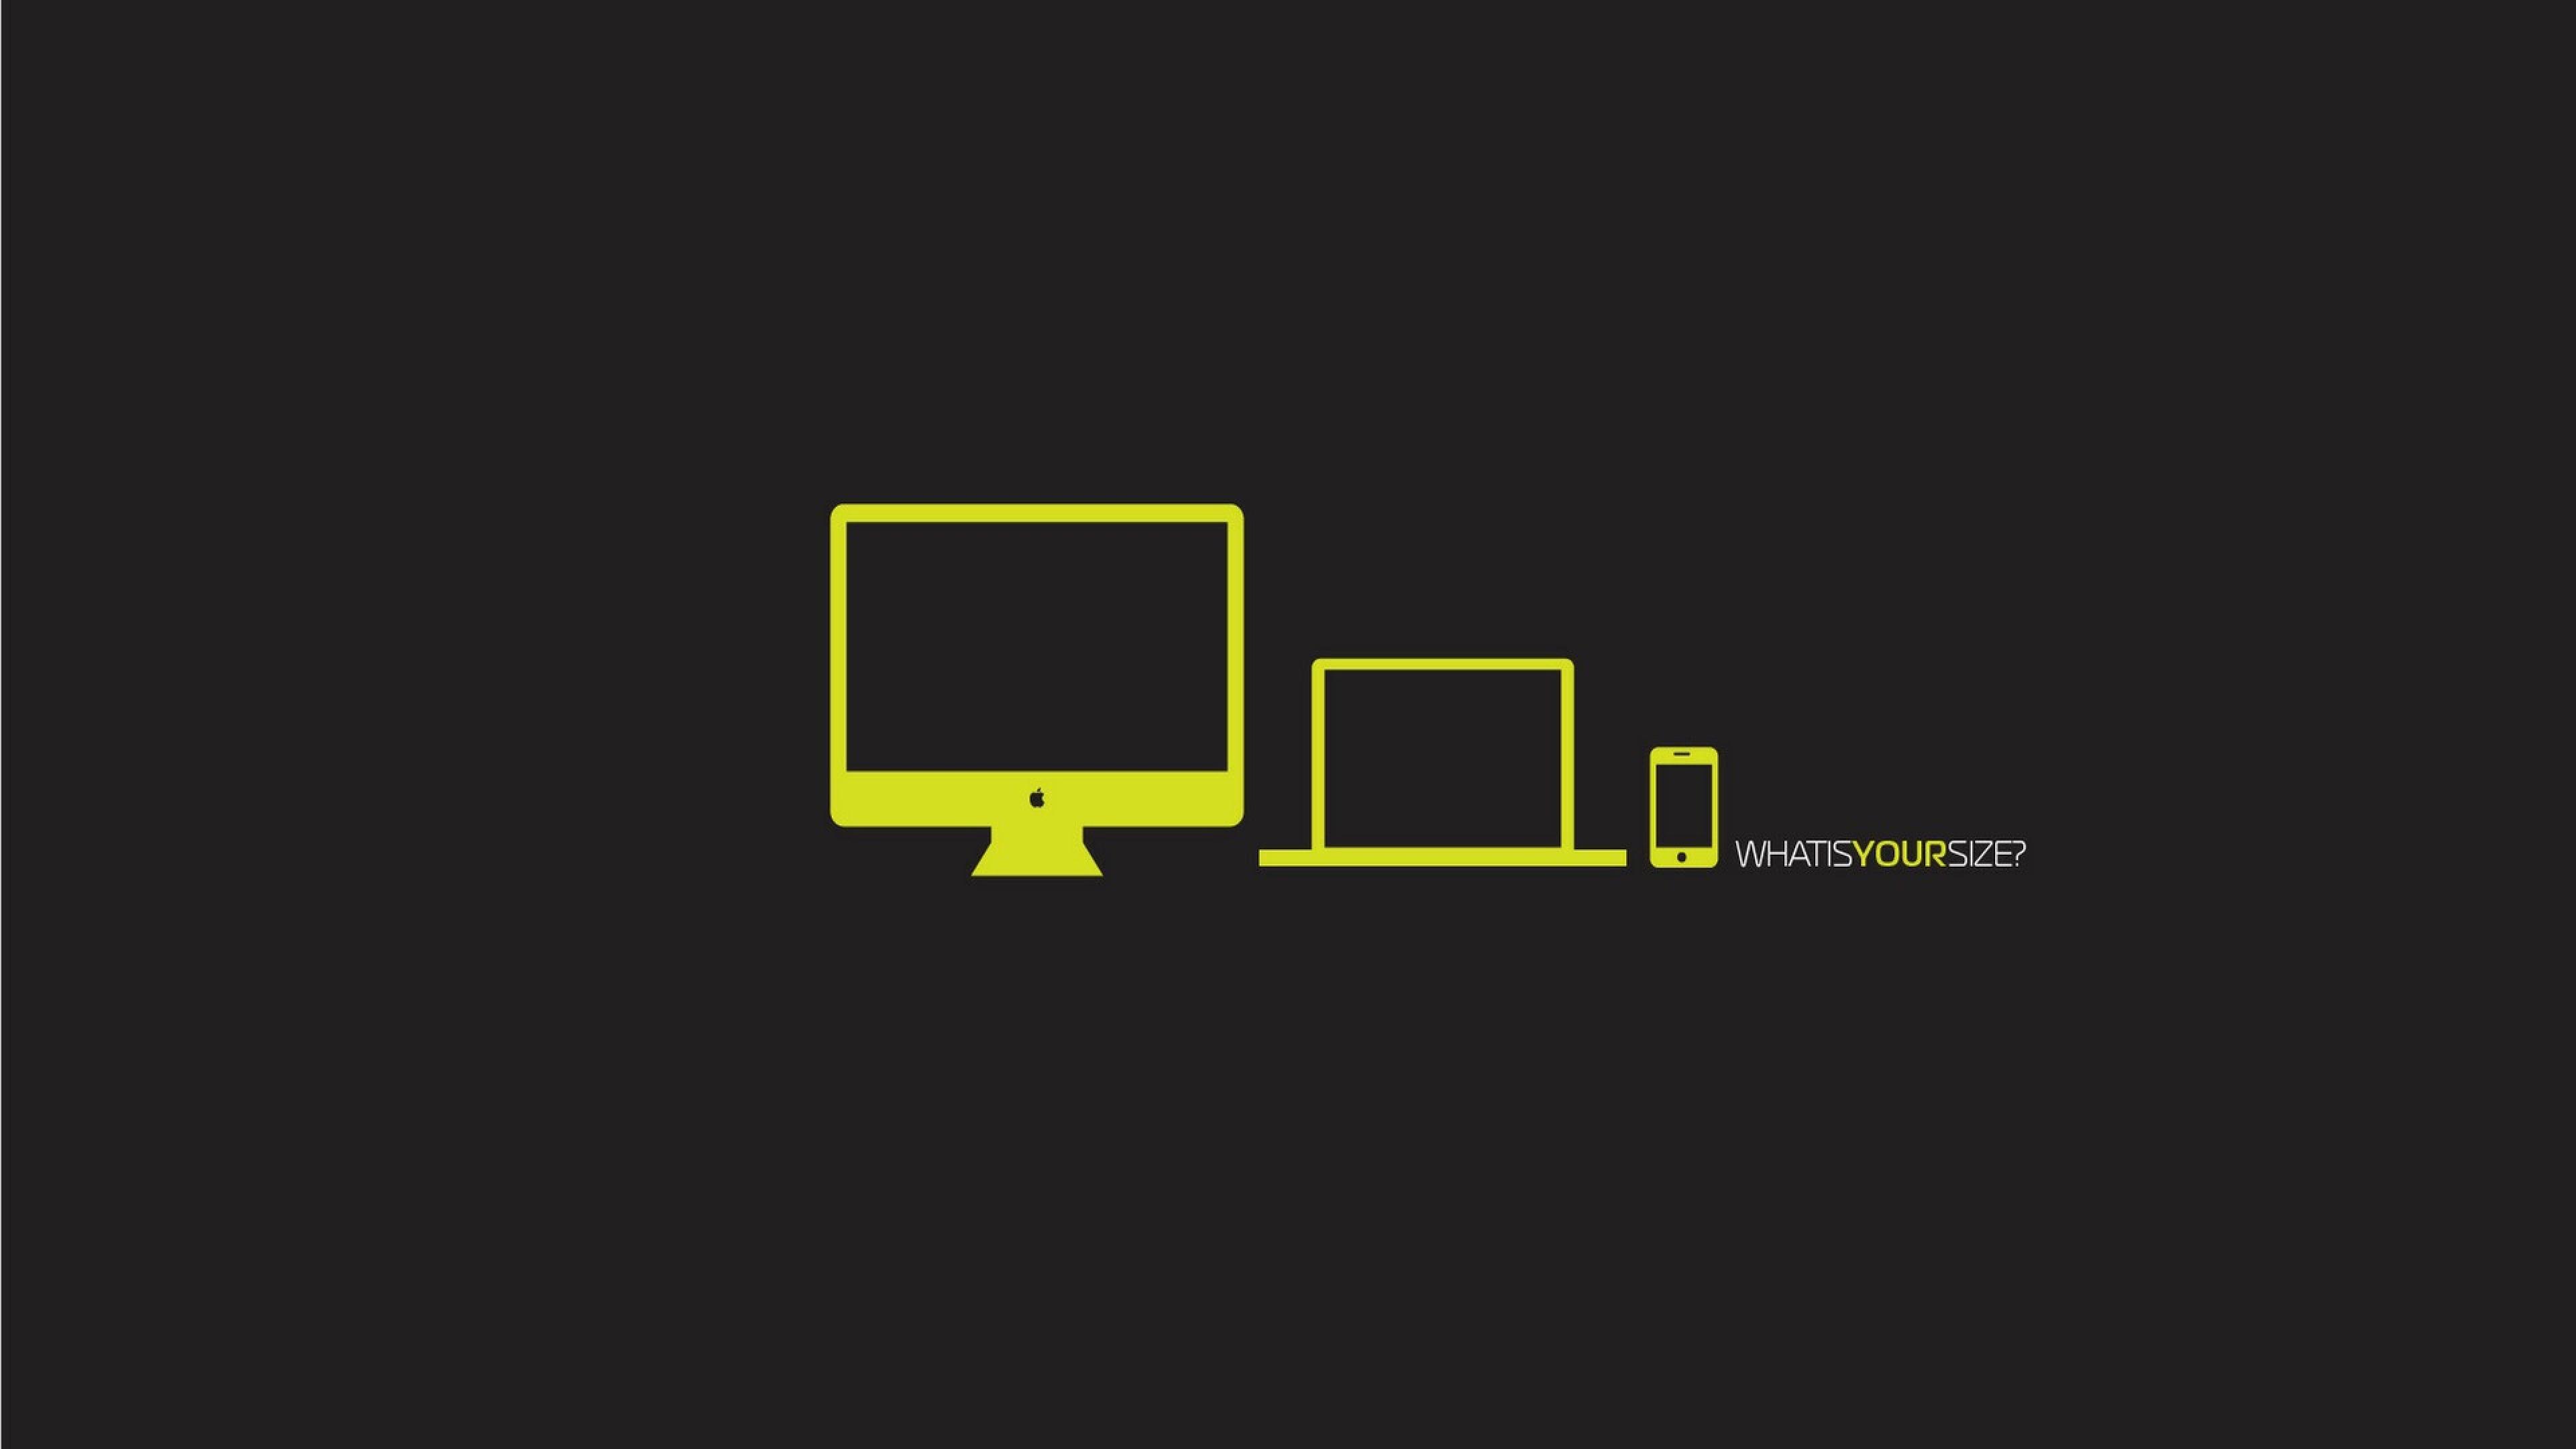 Preview wallpaper apple yellow computer macbook iphone 3840x2160 3840x2160